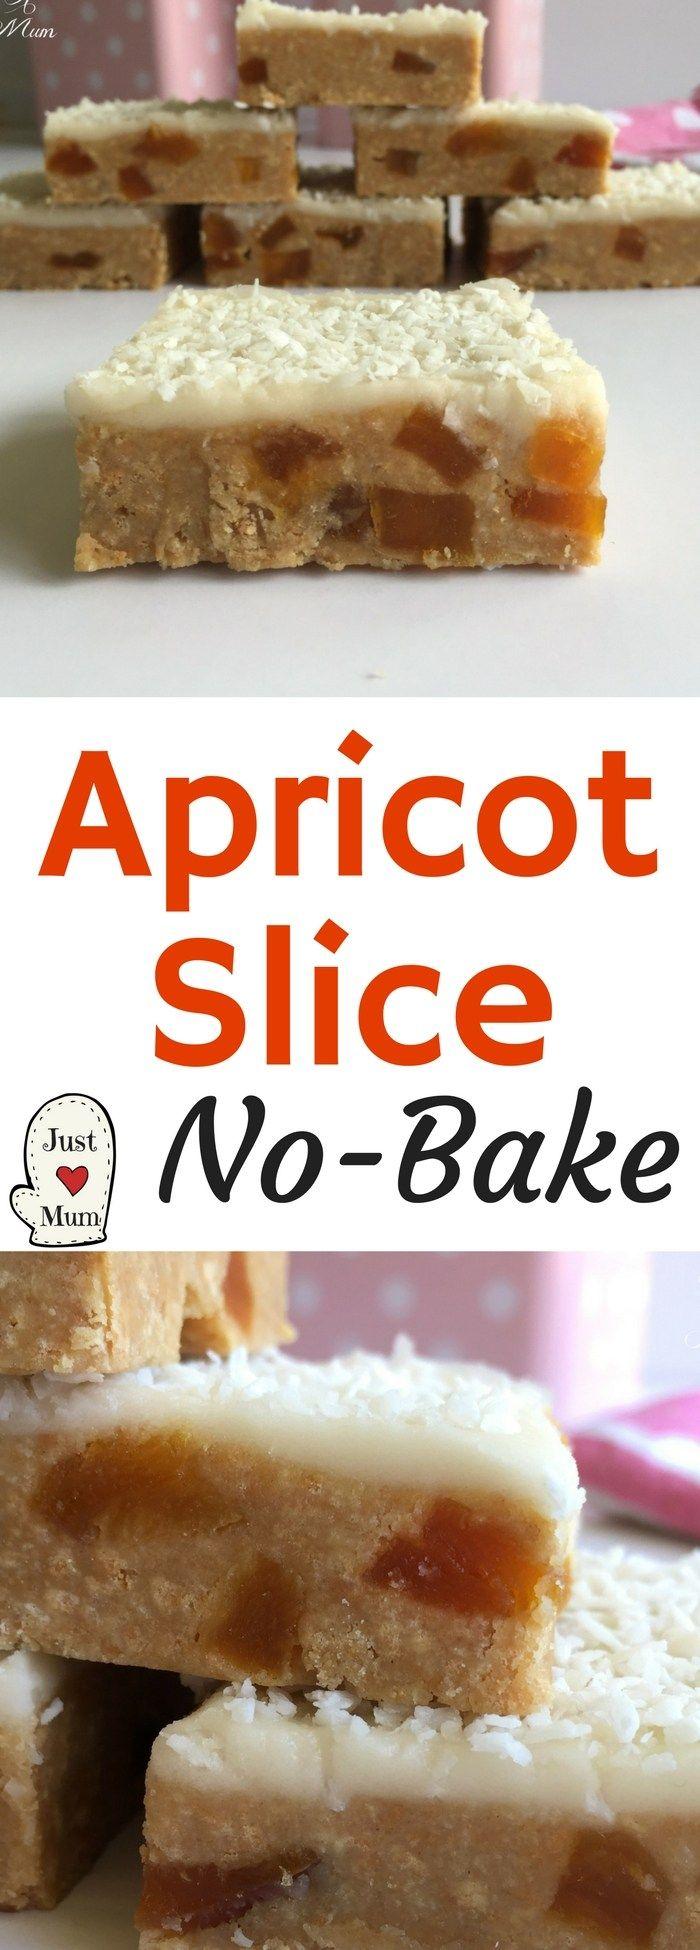 Just A Mum's No Bake Apricot Slice